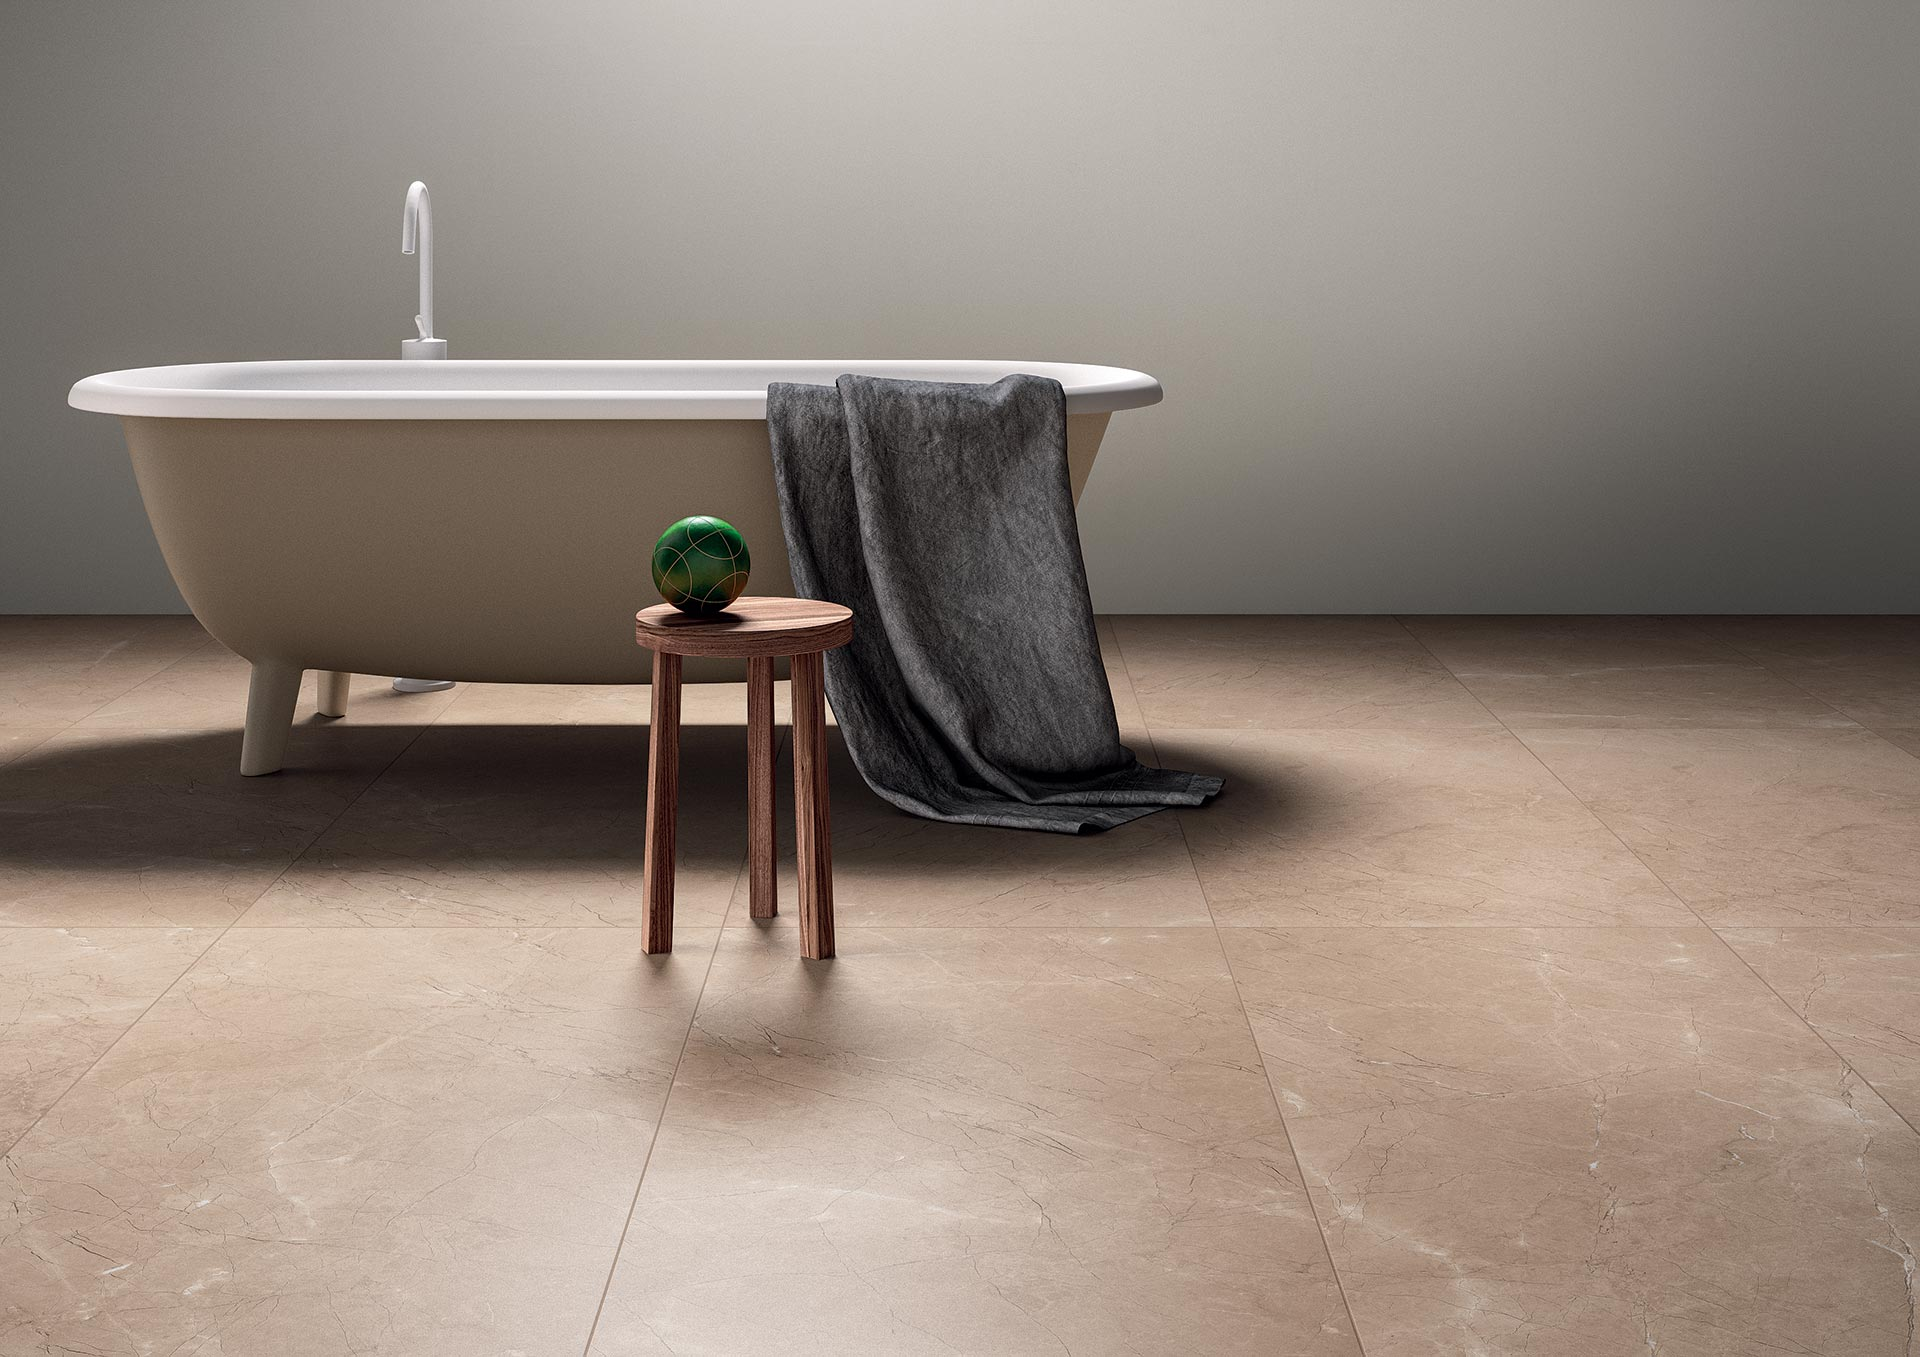 Hydropolis, fabricant de salles de bain haut de gamme - Collection baignoire Agape